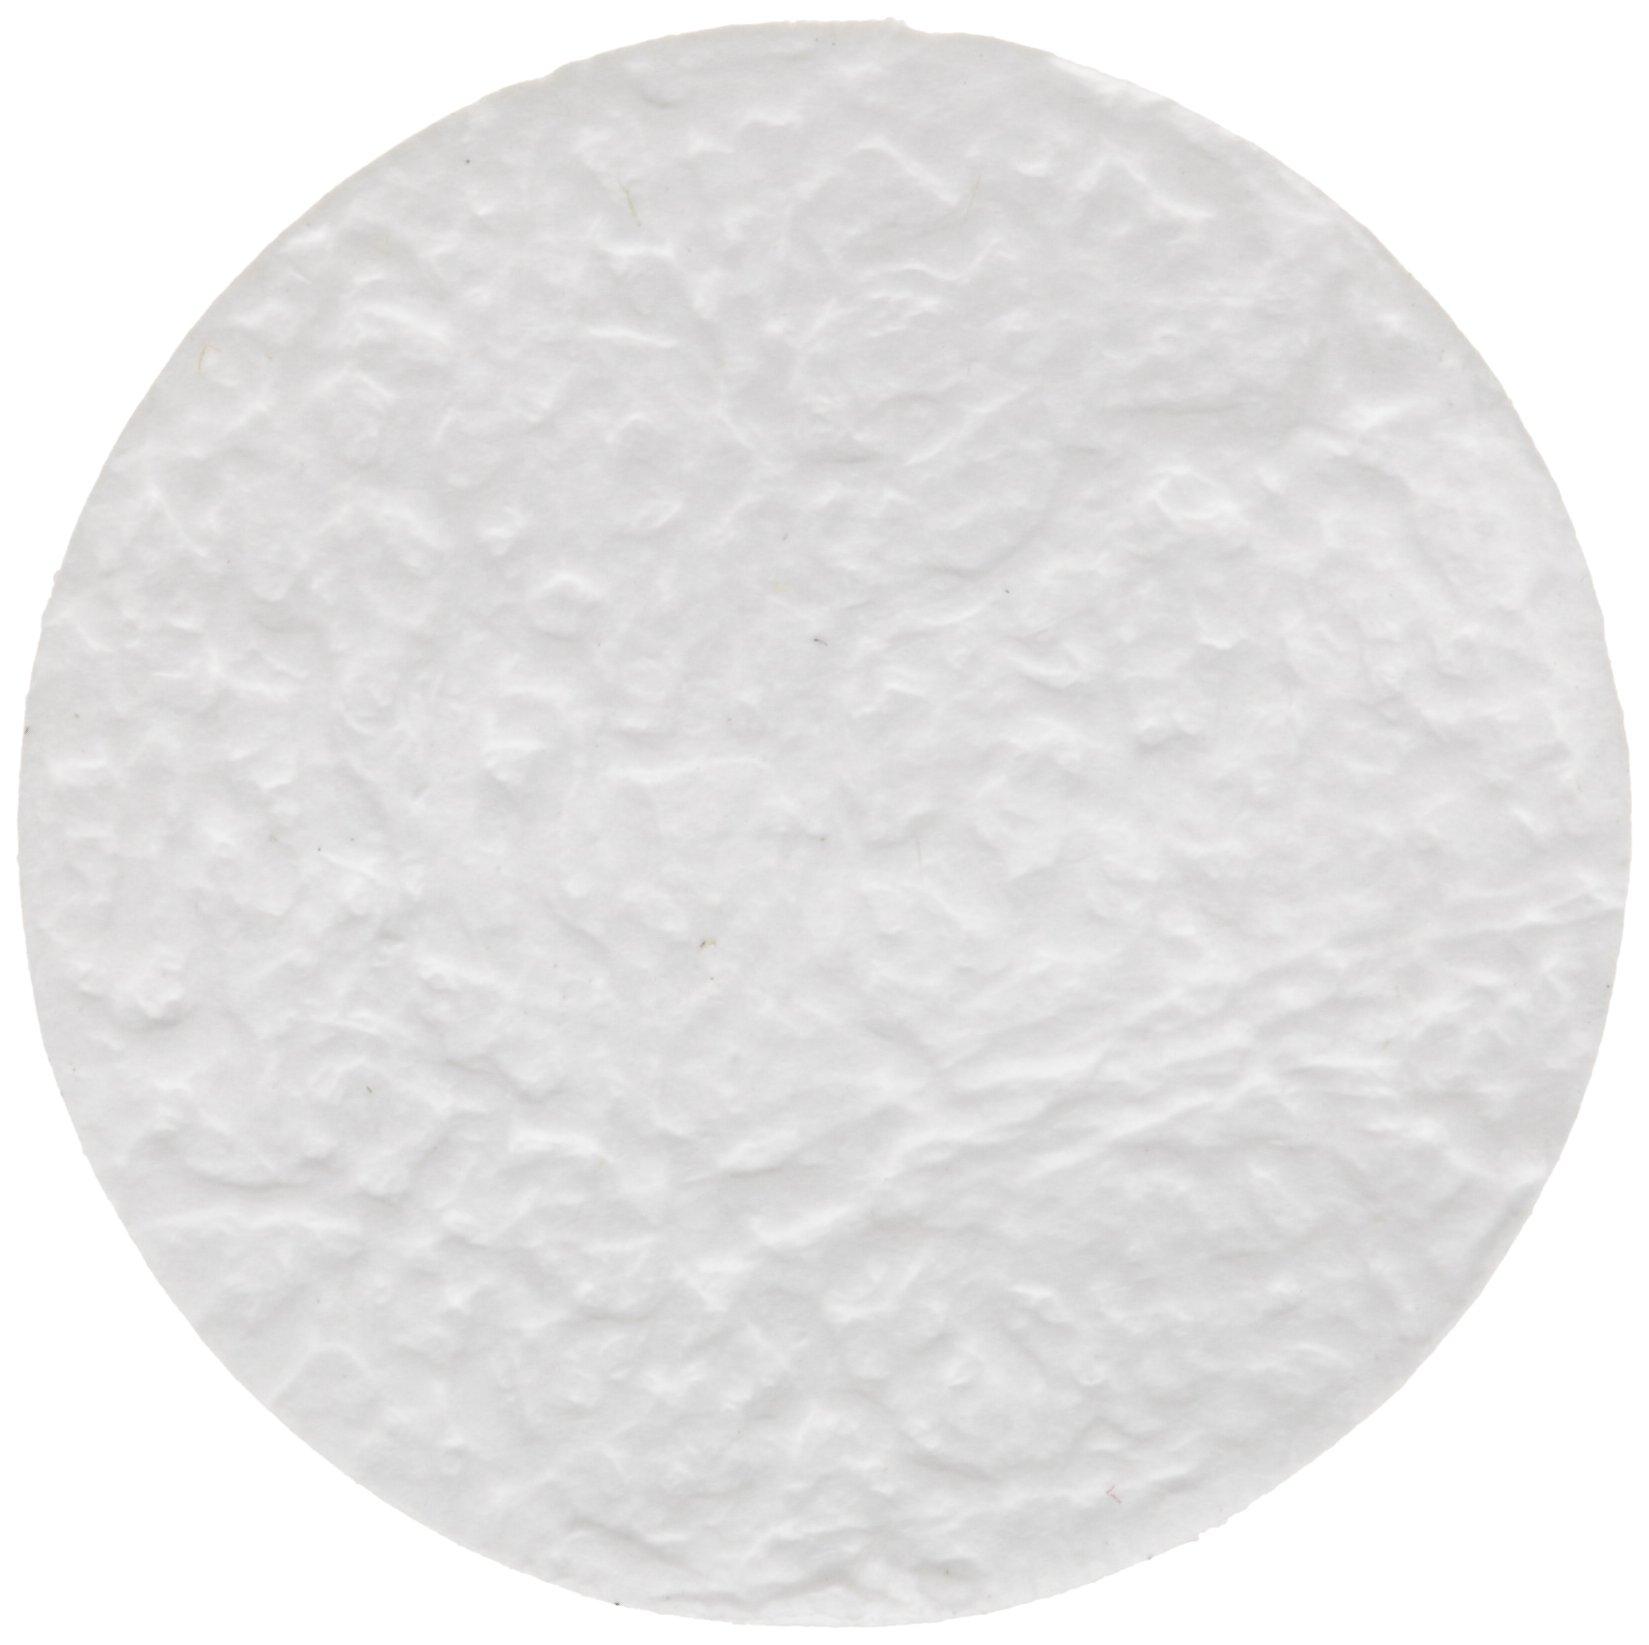 Ahlstrom 1510-0250 Borosilicate Glass Microfiber Filter Paper, 0.7 Micron, Slow Flow, Grade 151, 2.5cm Diameter (Box of 100)